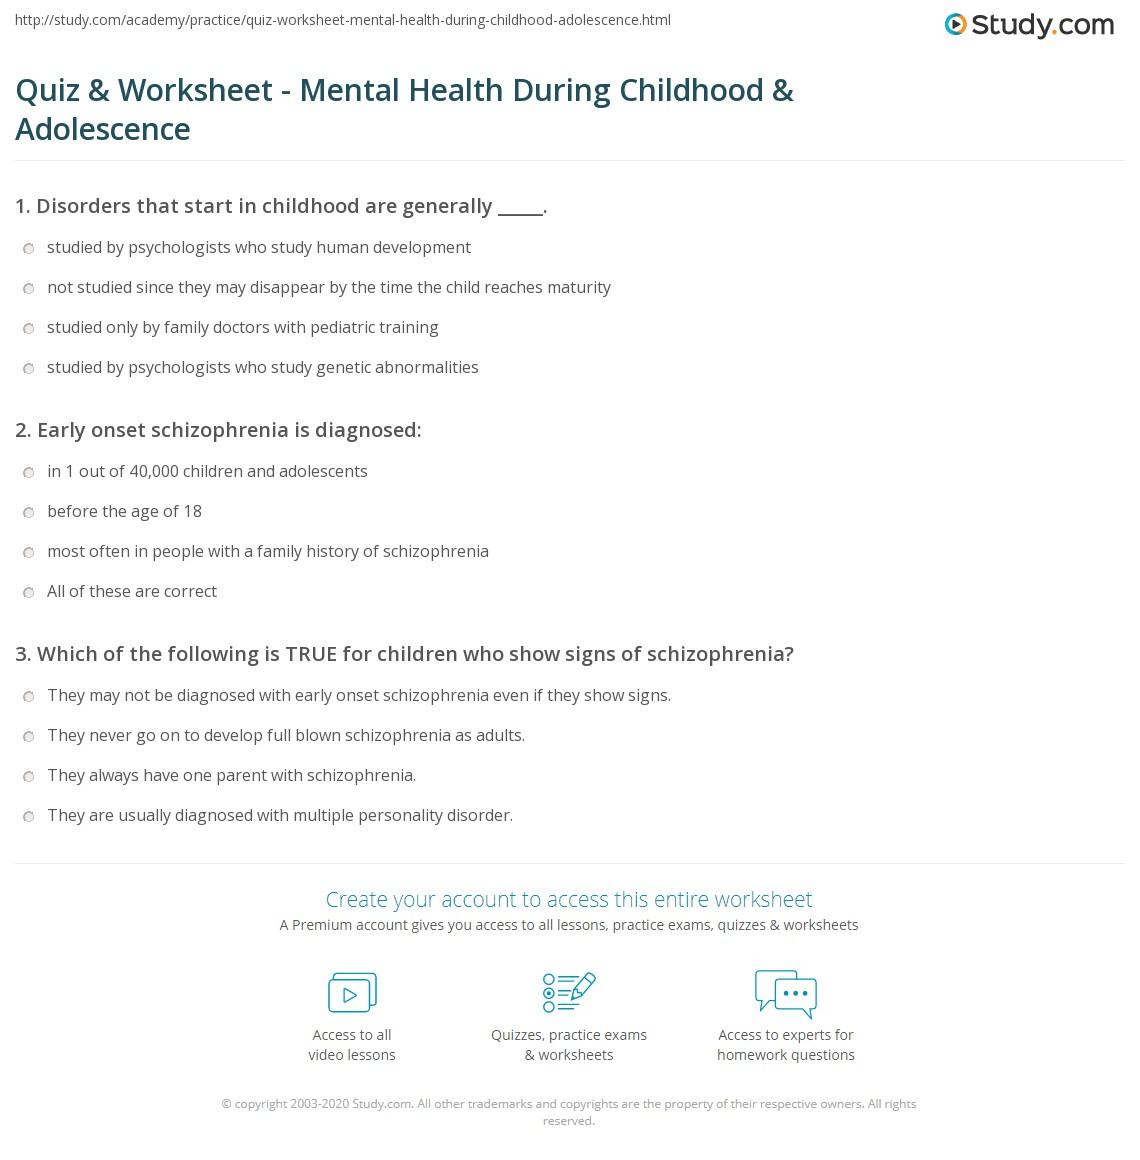 Quiz Worksheet Mental Health During Childhood